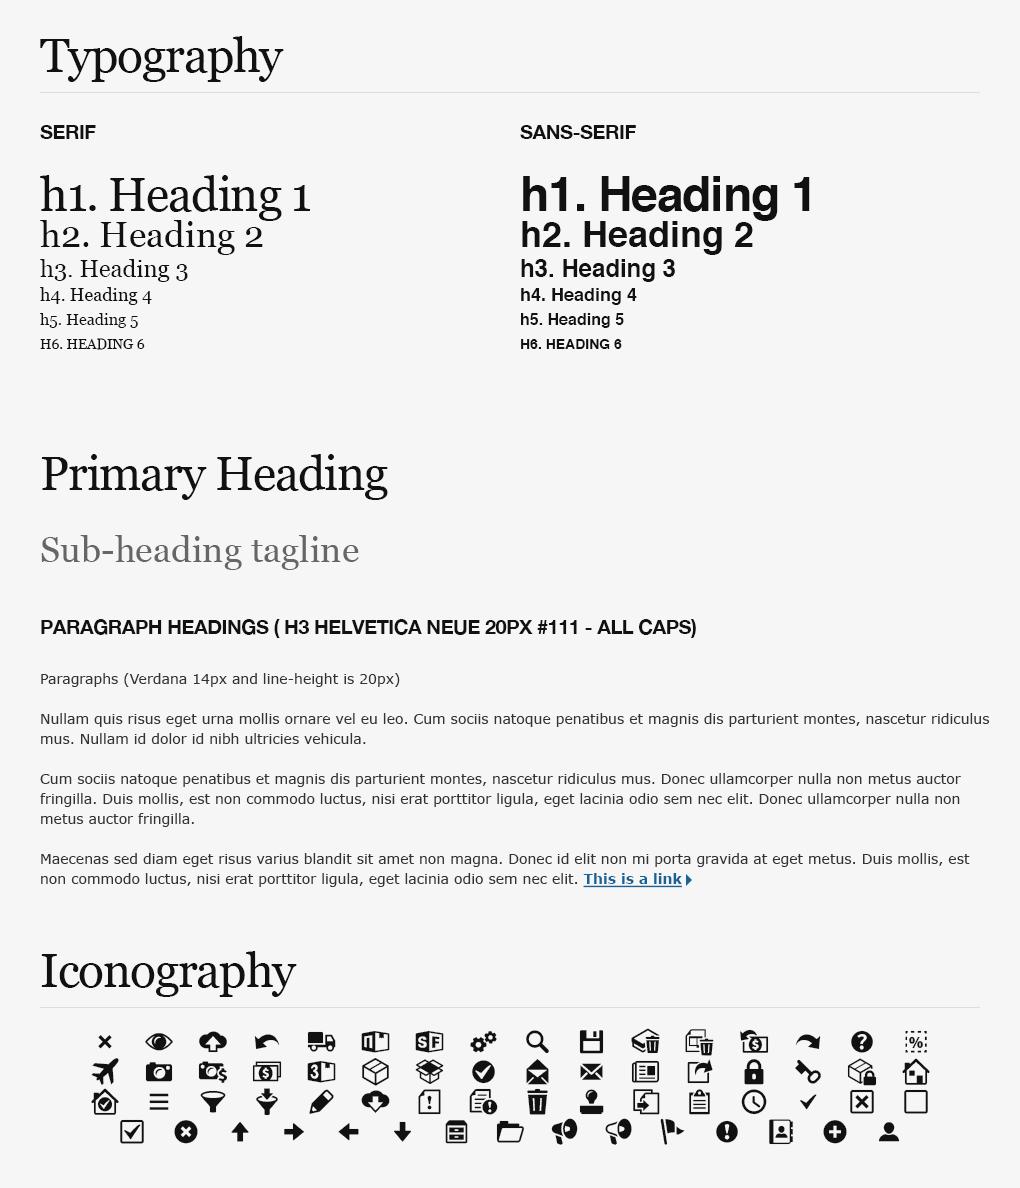 Shopfans Desktop Web App Typography & Iconography Styleguide